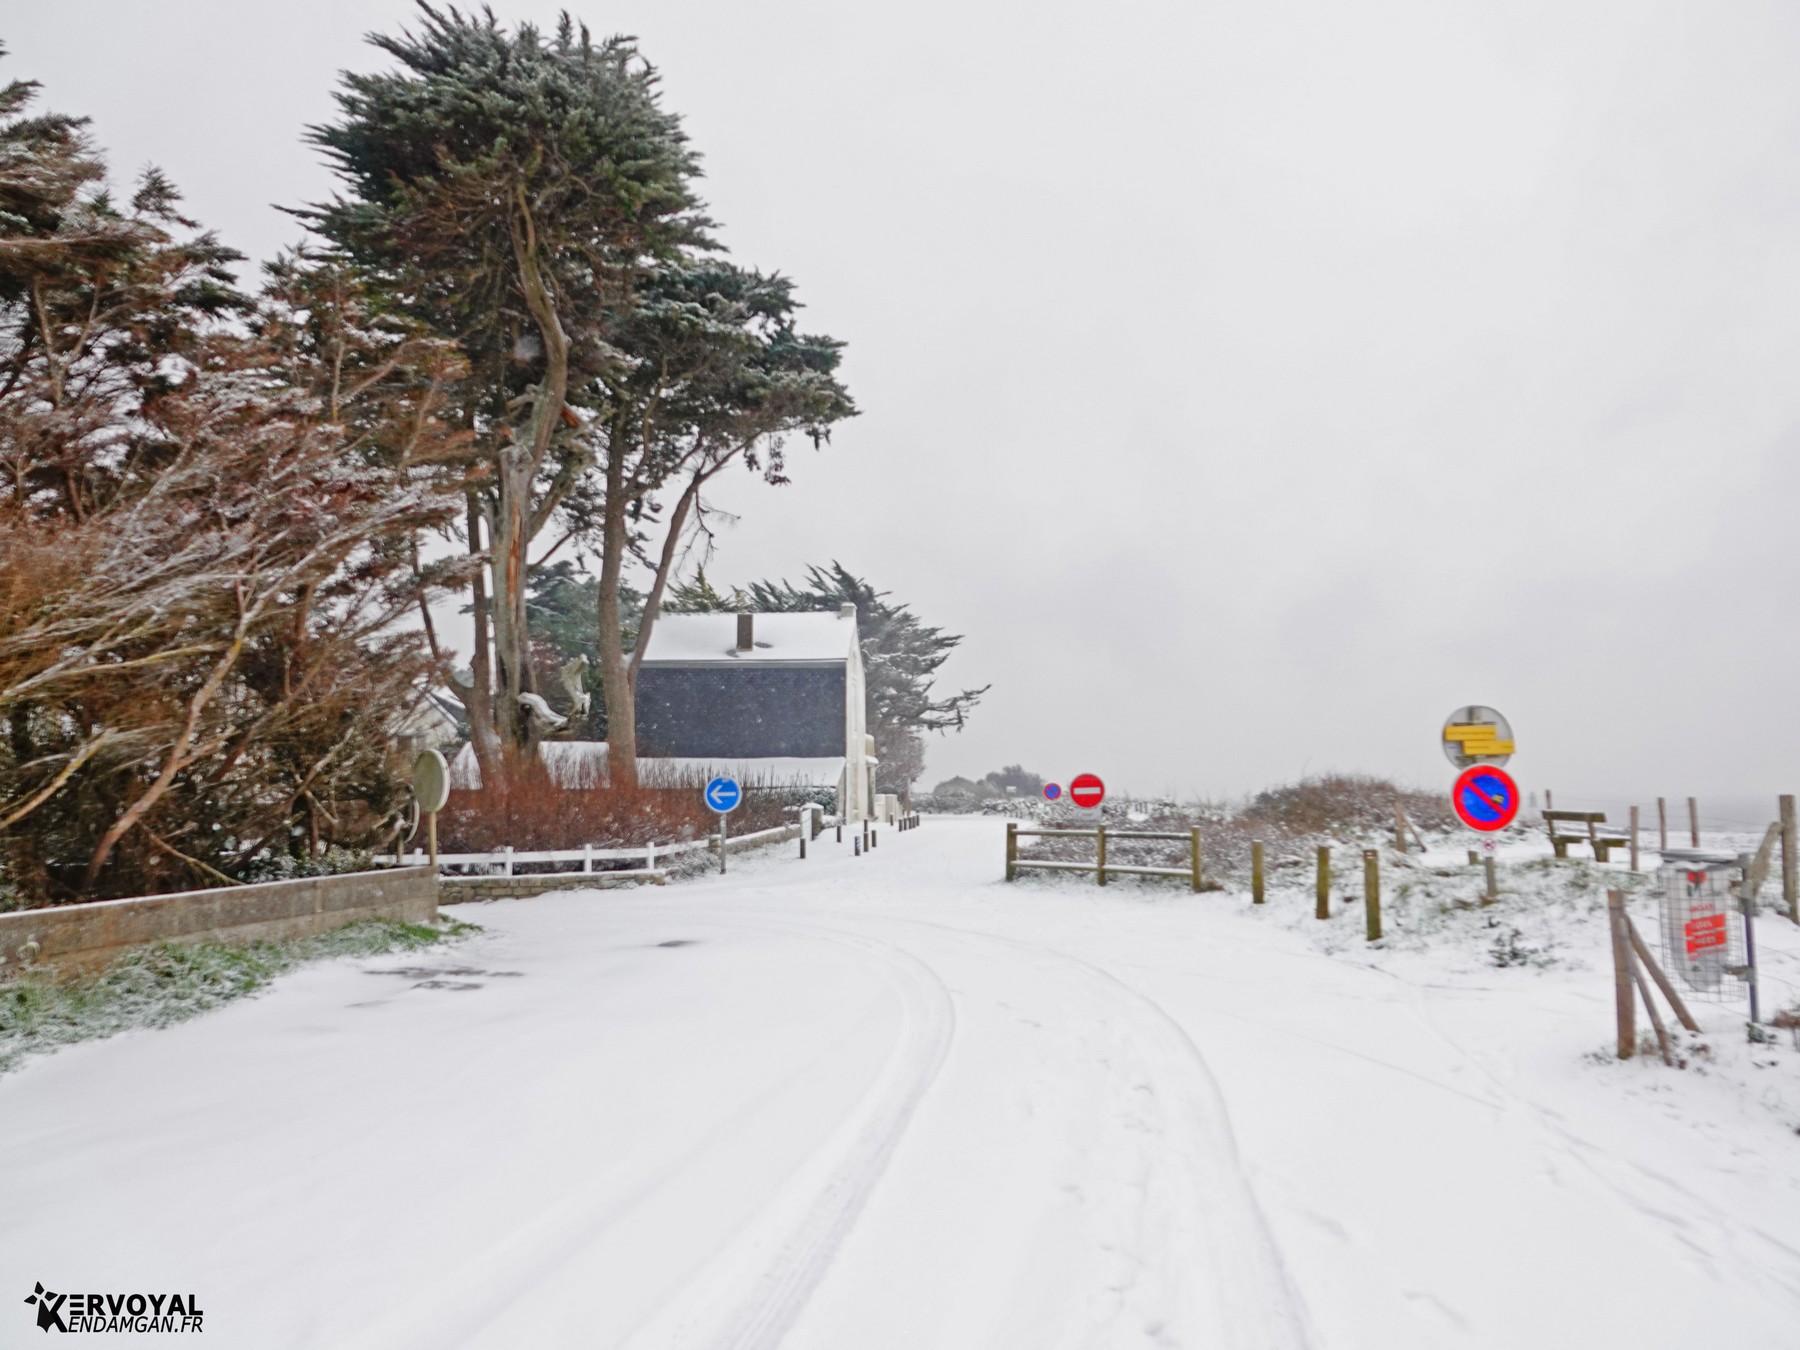 neige à kervoyal 11 février 2021 damgan morbihan (7)